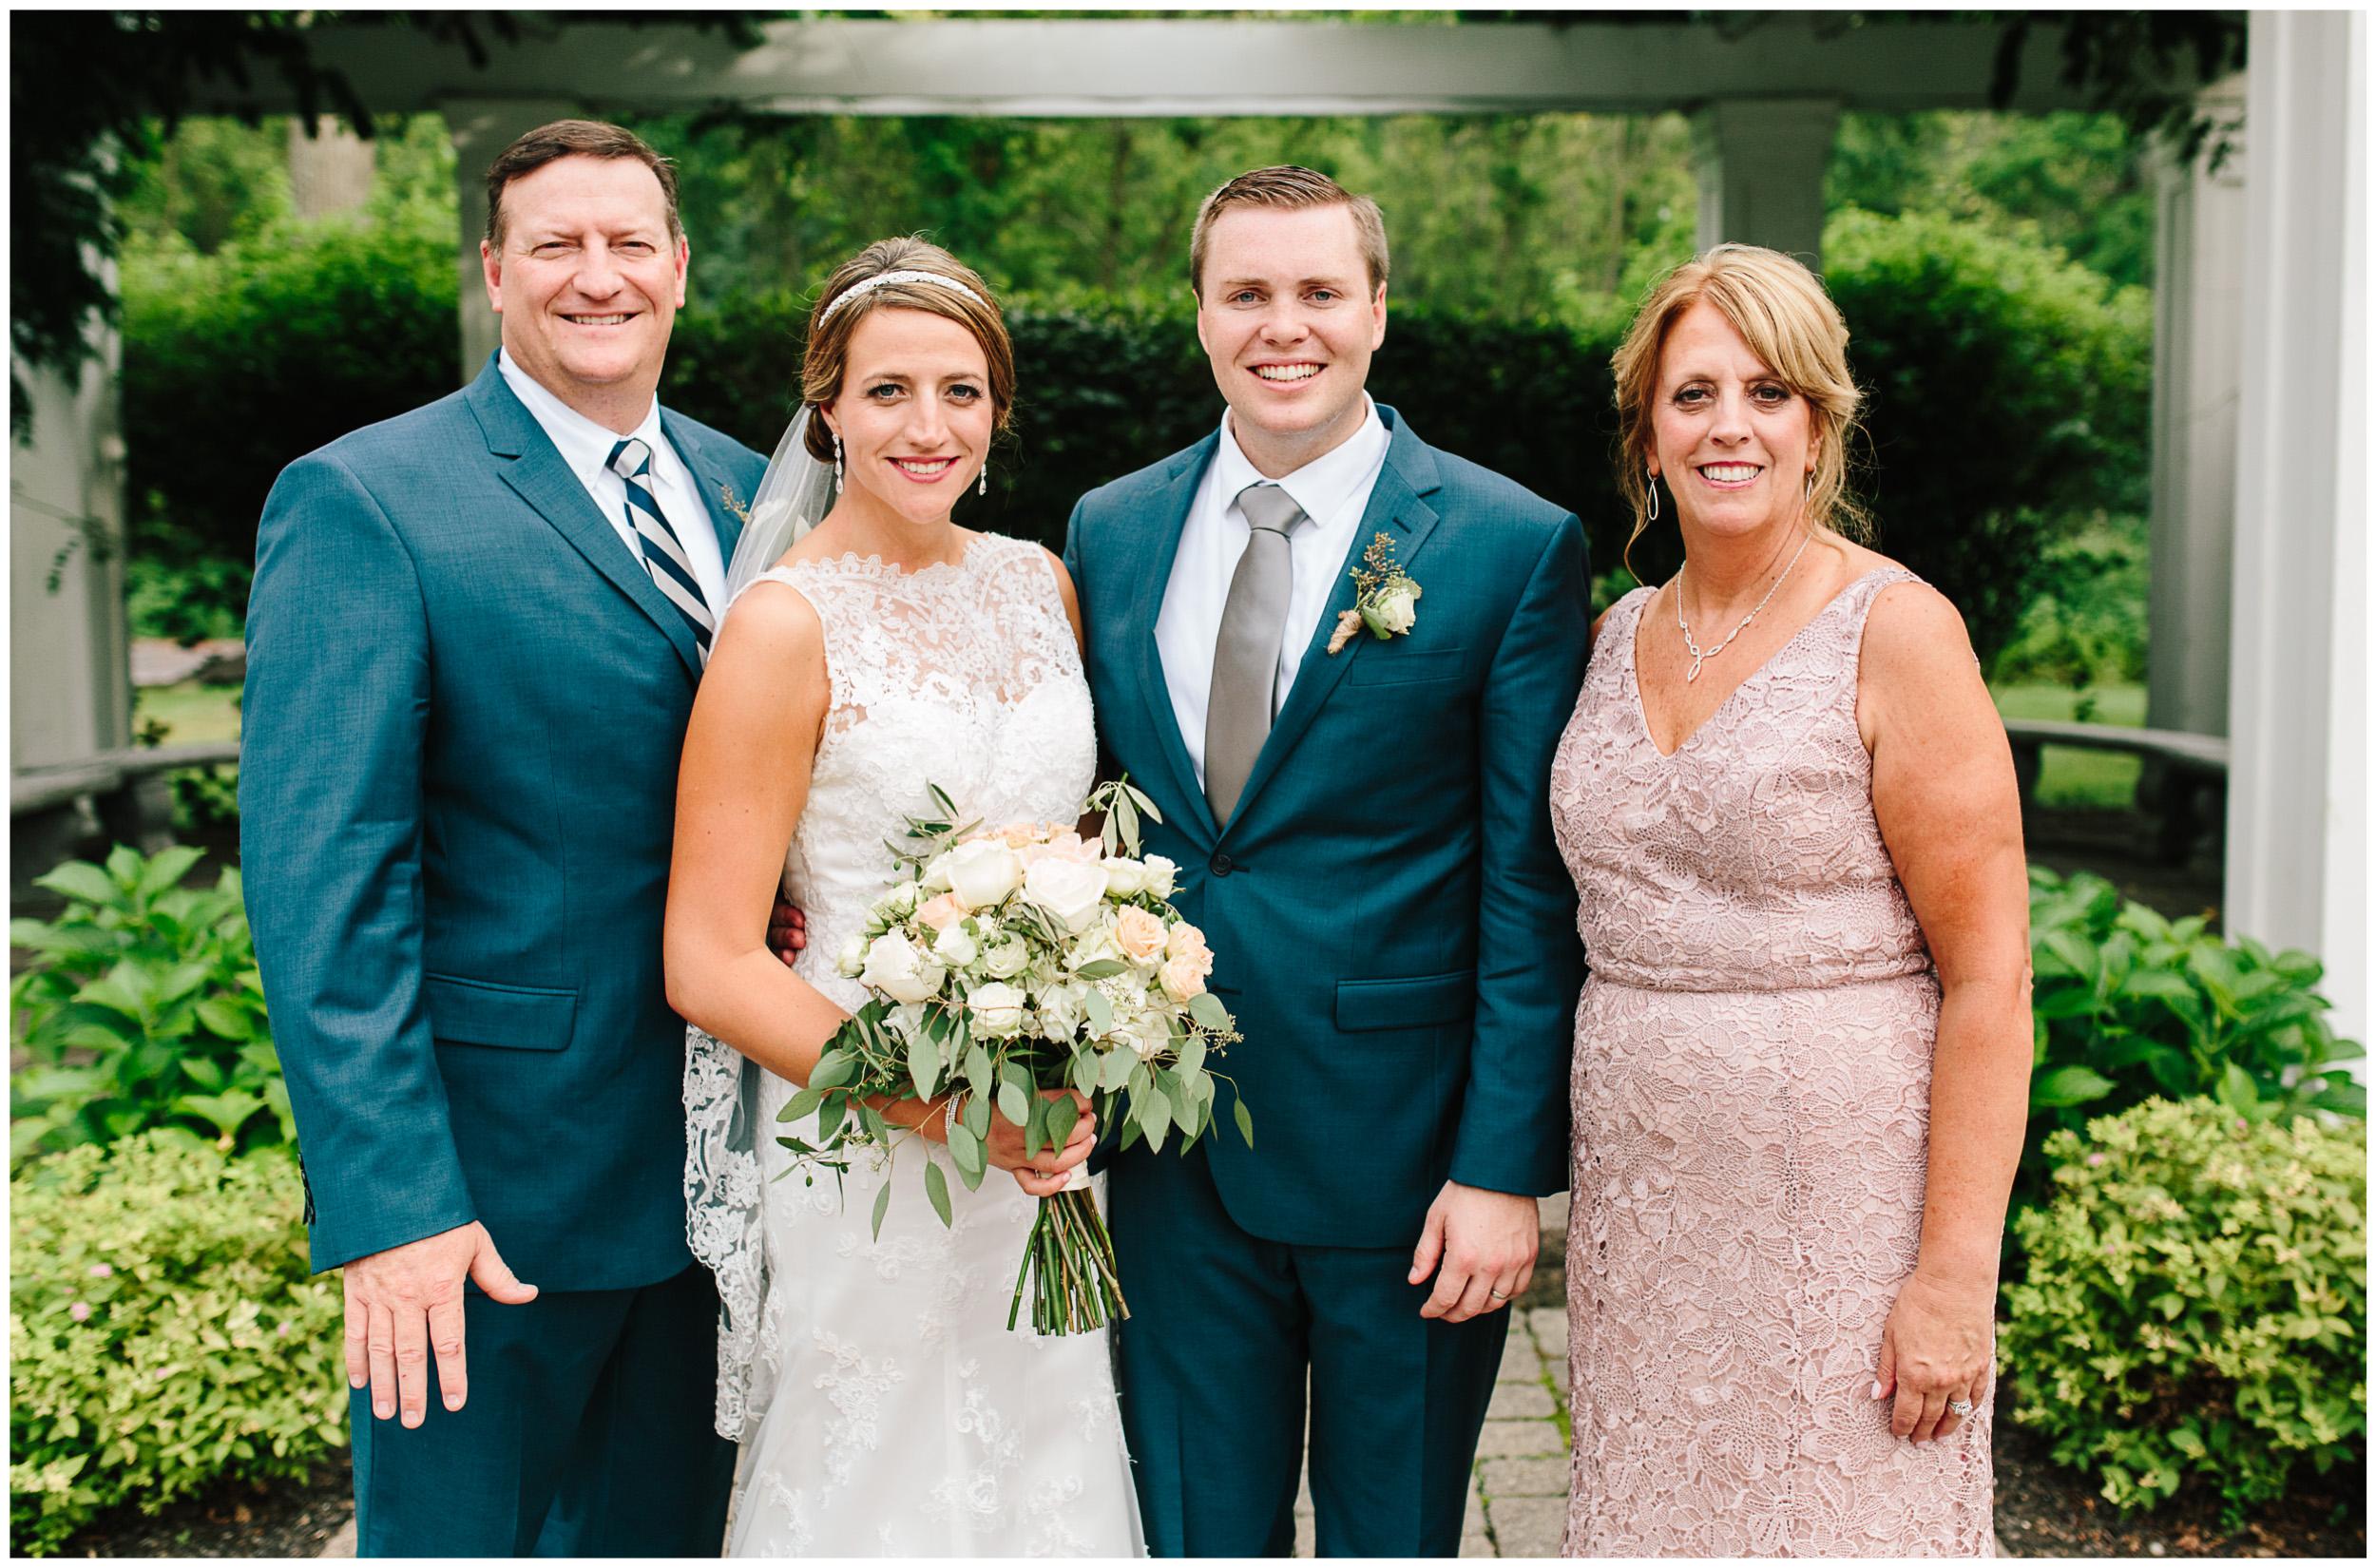 ann_arbor_michigan_wedding_72.jpg